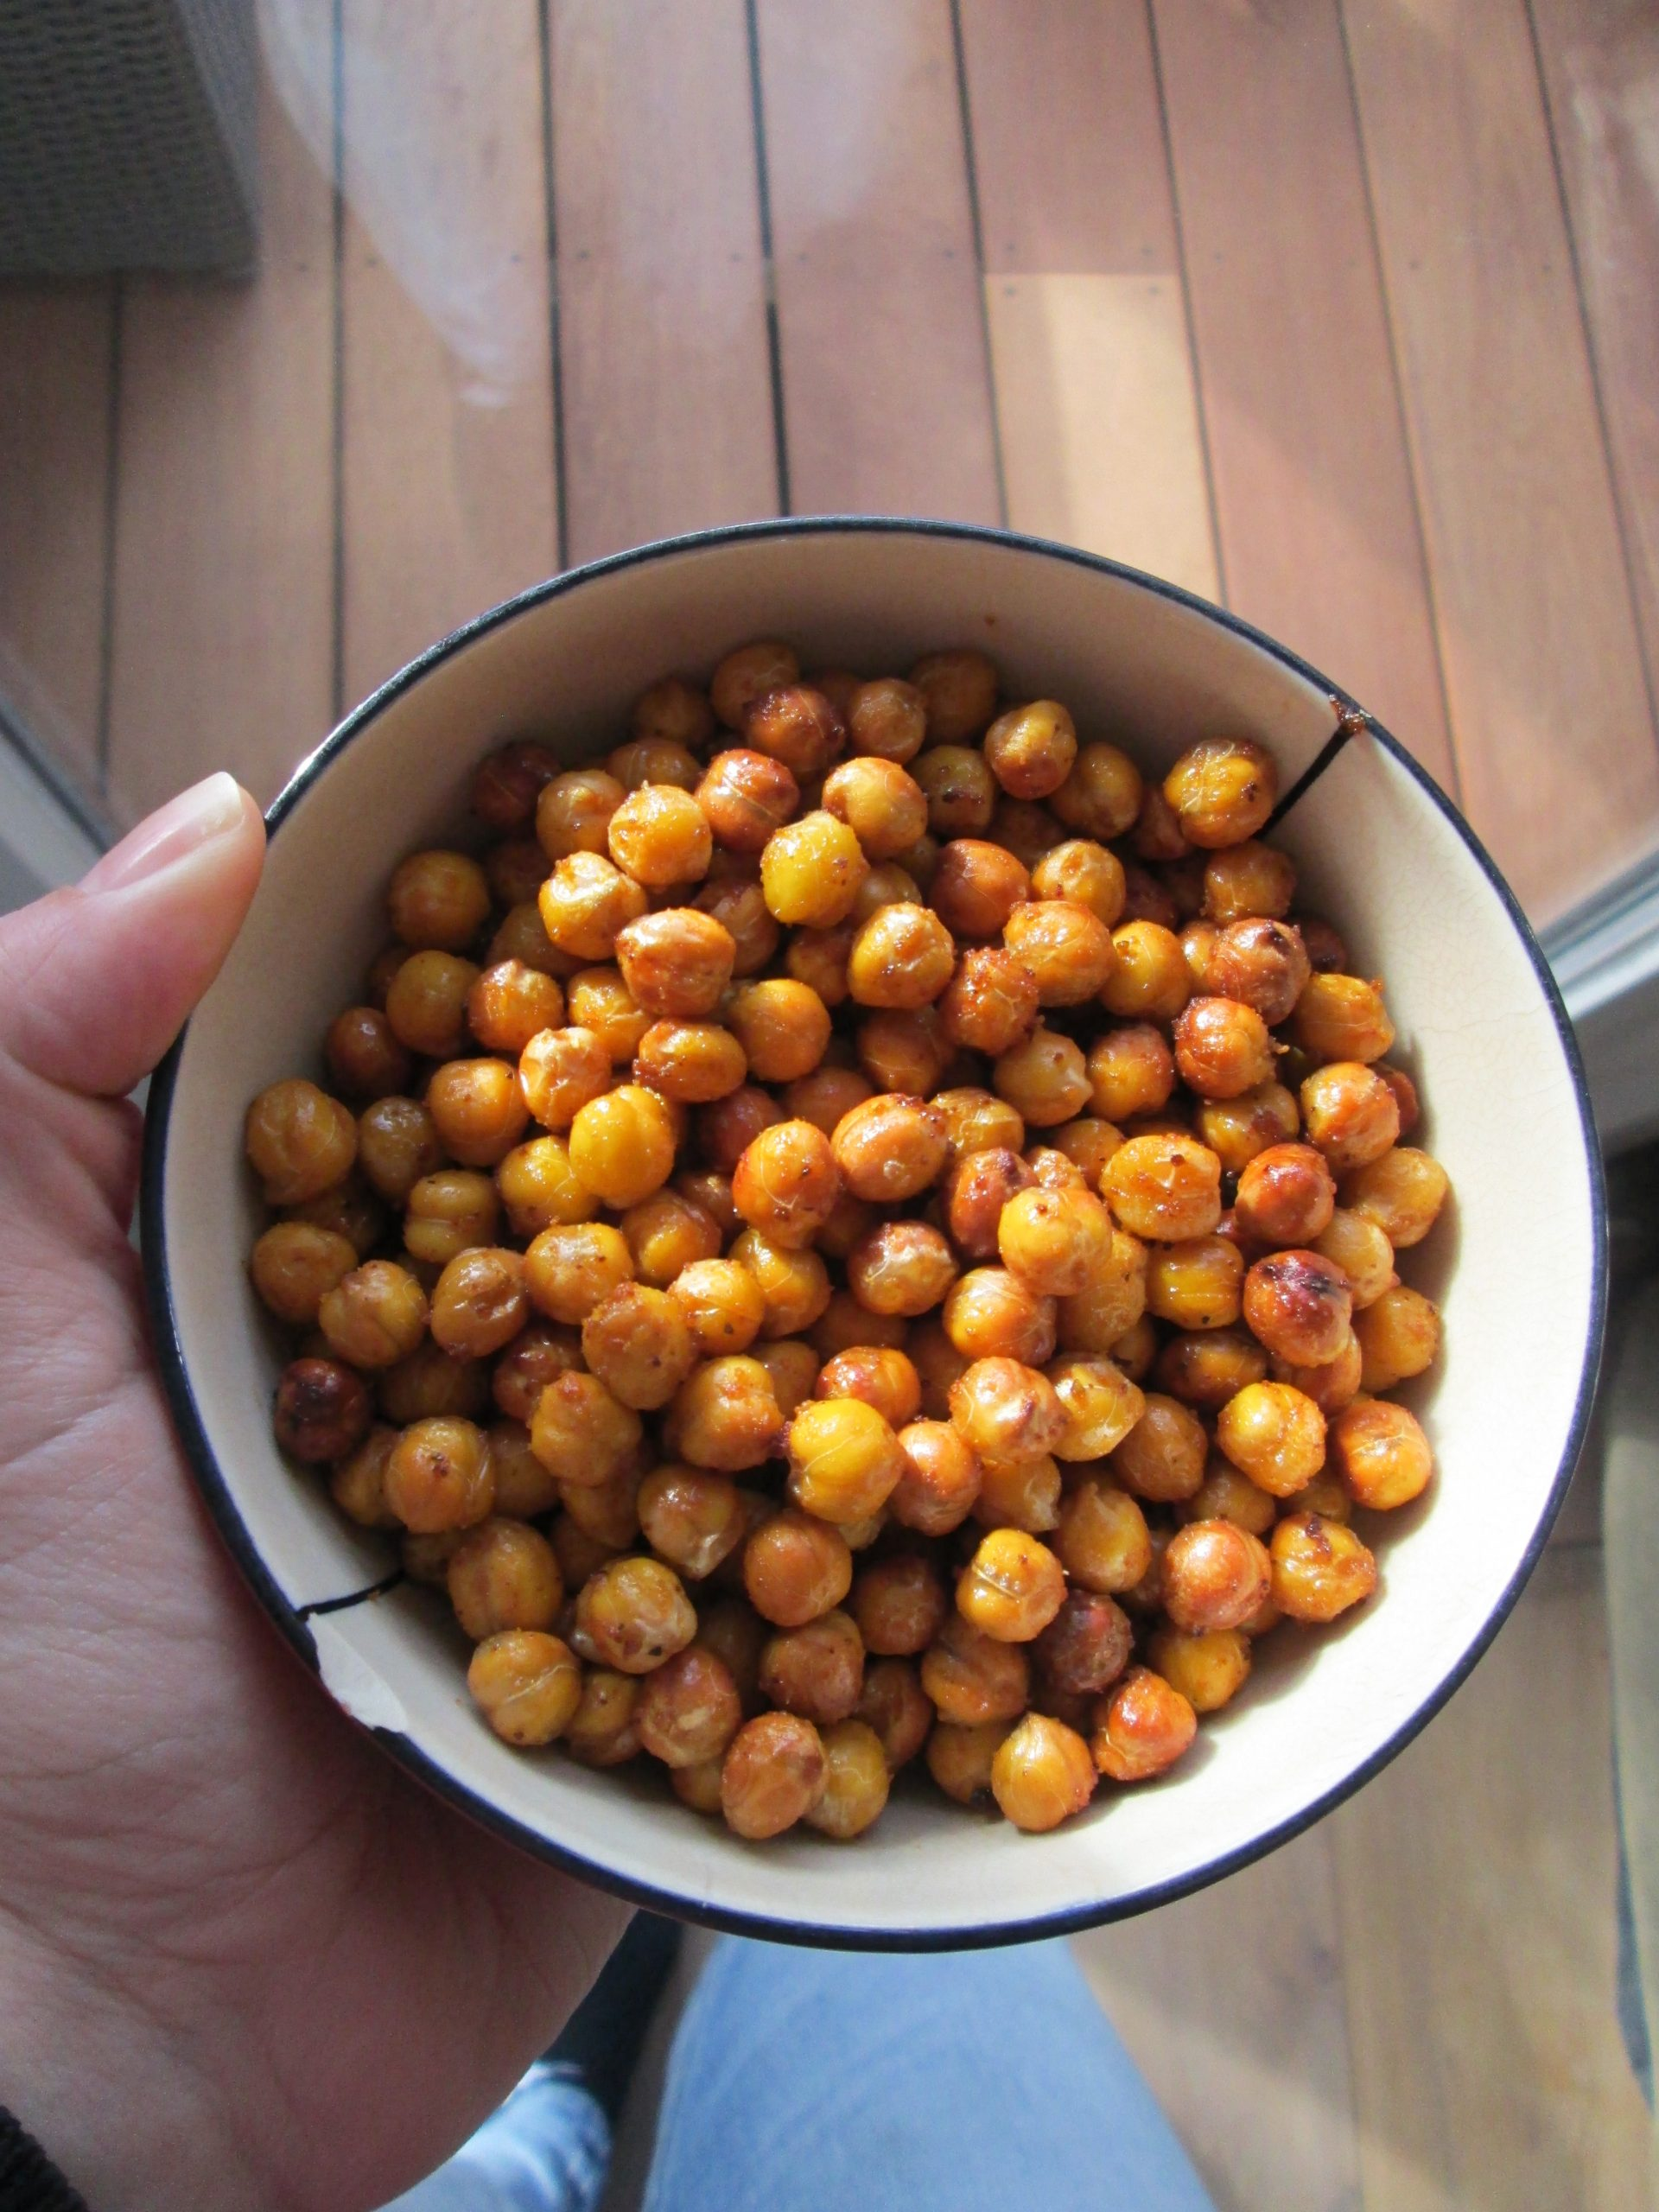 Zero waste snack: roasted chickpeas